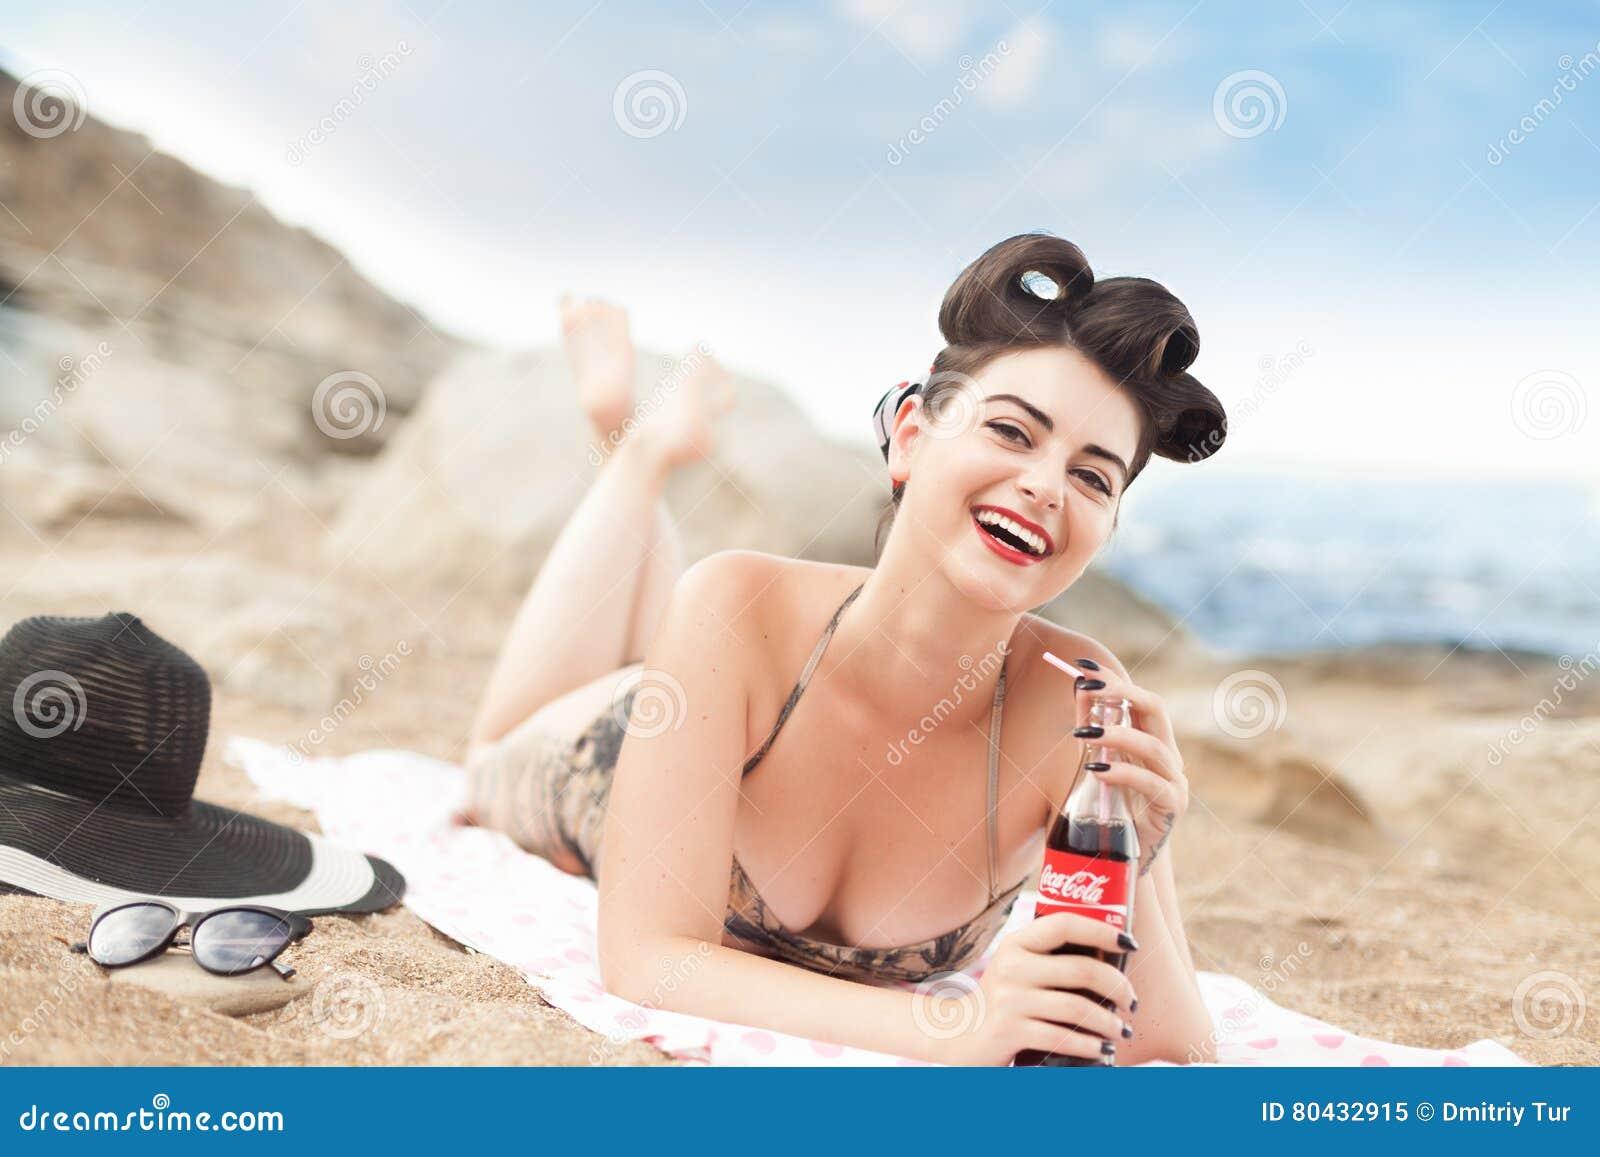 pictures american nude porno